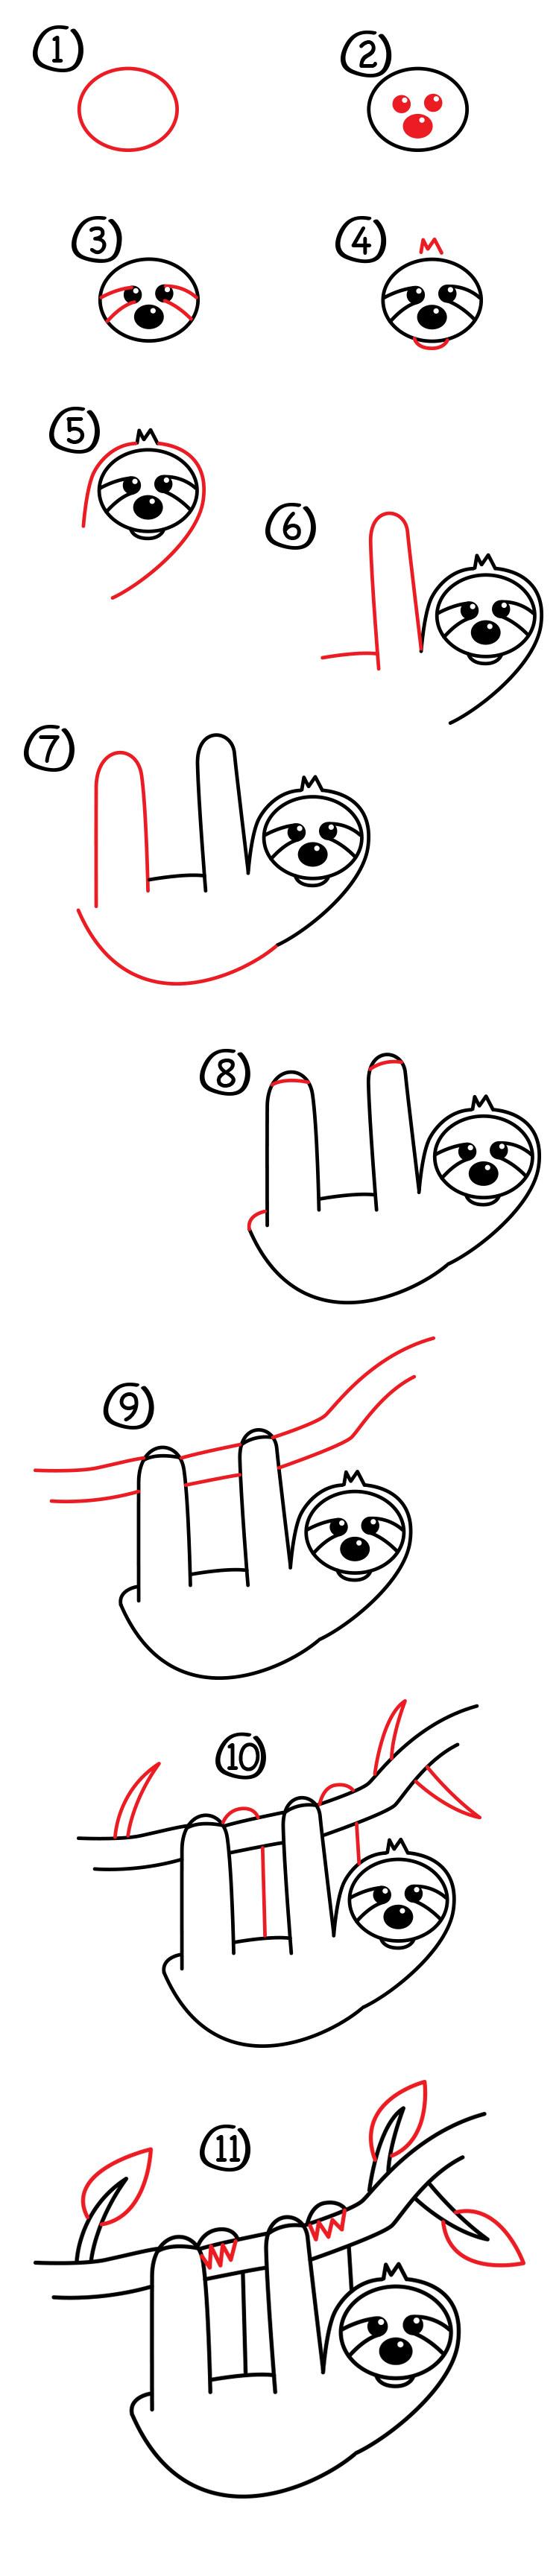 How To Draw A Cartoon Sloth - Art For Kids Hub